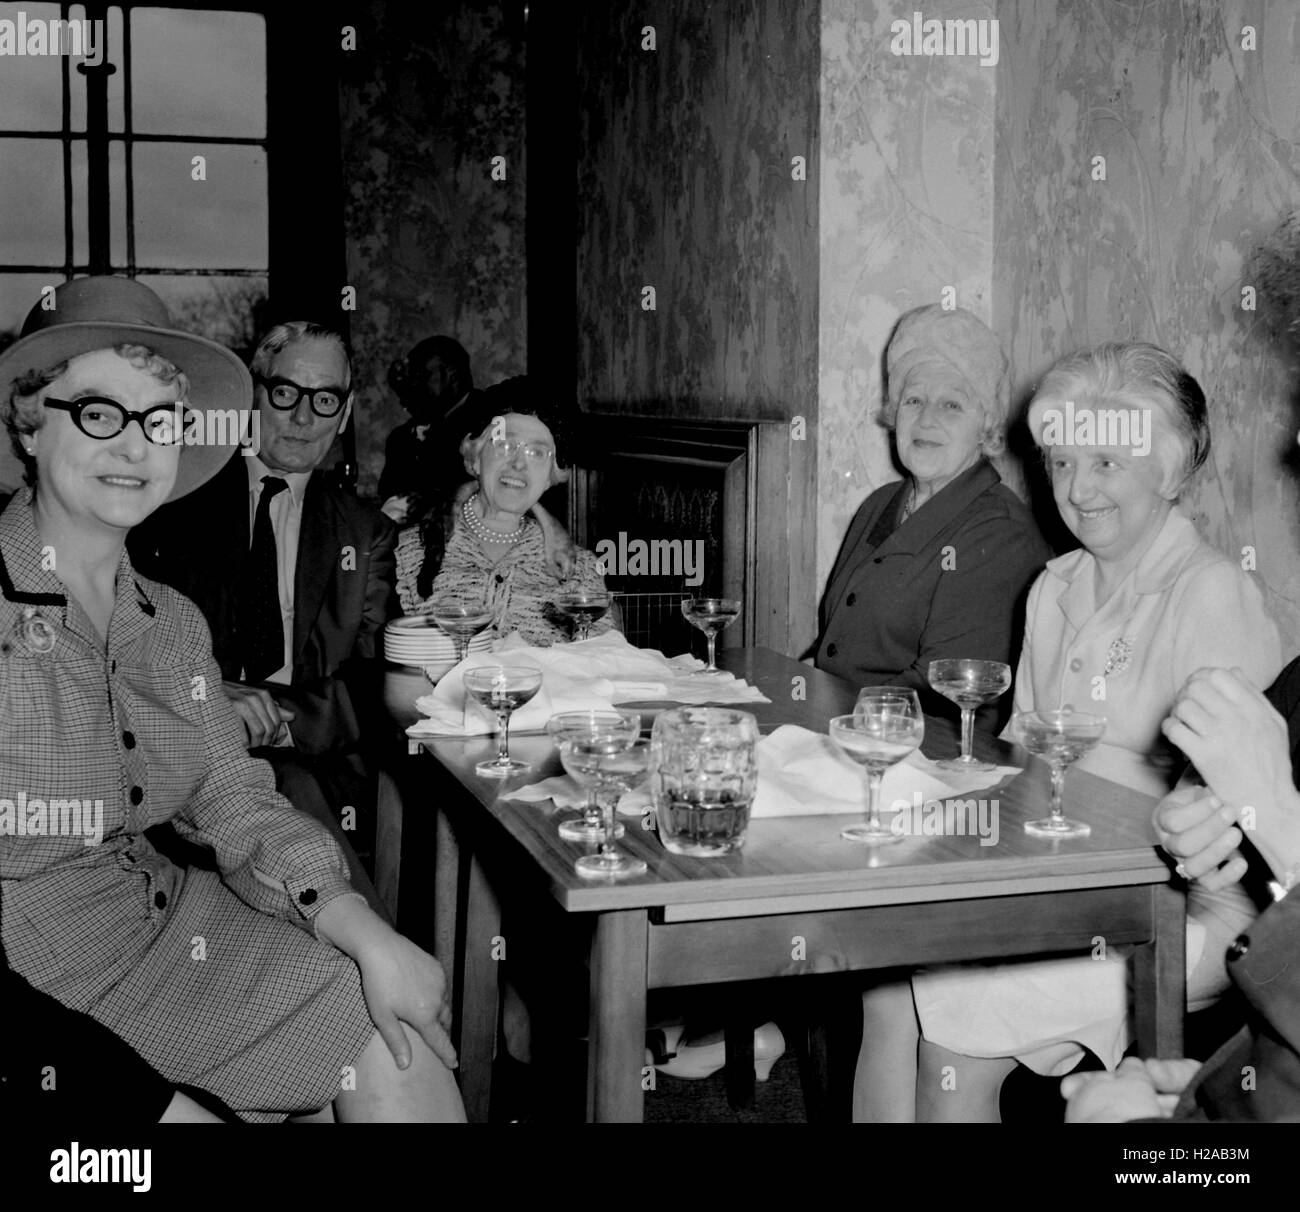 Wedding Day, at the reception. Social history, England c1960. Photo by Tony Henshaw - Stock Image